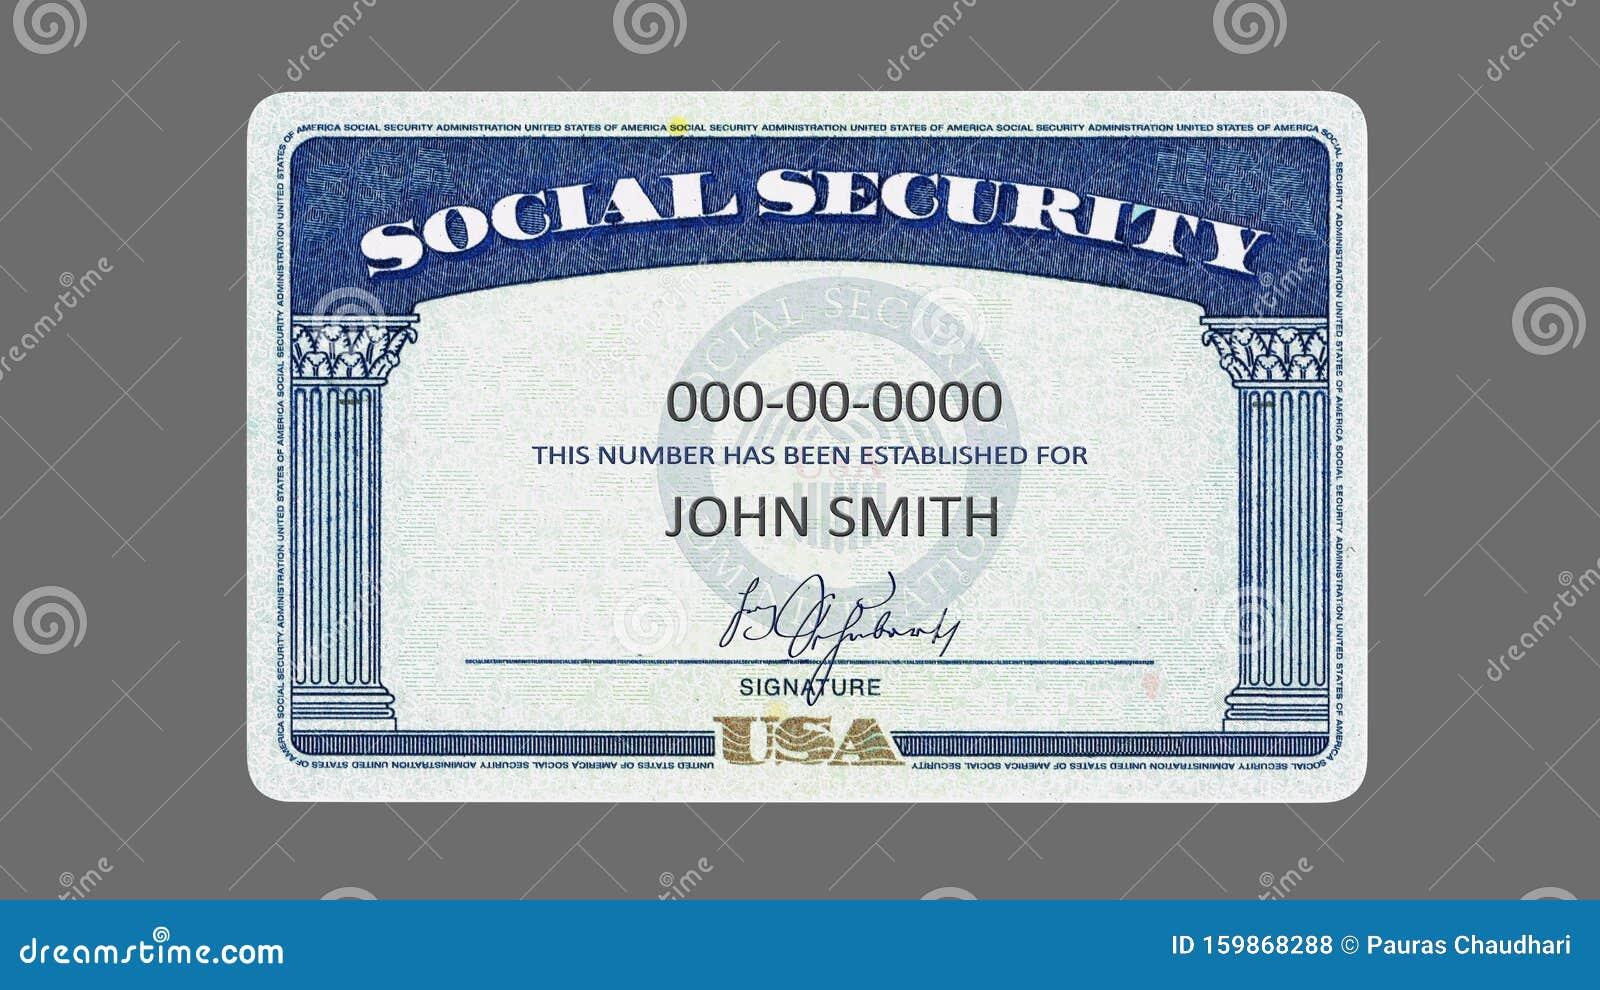 21,21 Social Security Card Photos - Free & Royalty-Free Stock With Regard To Social Security Card Template Free